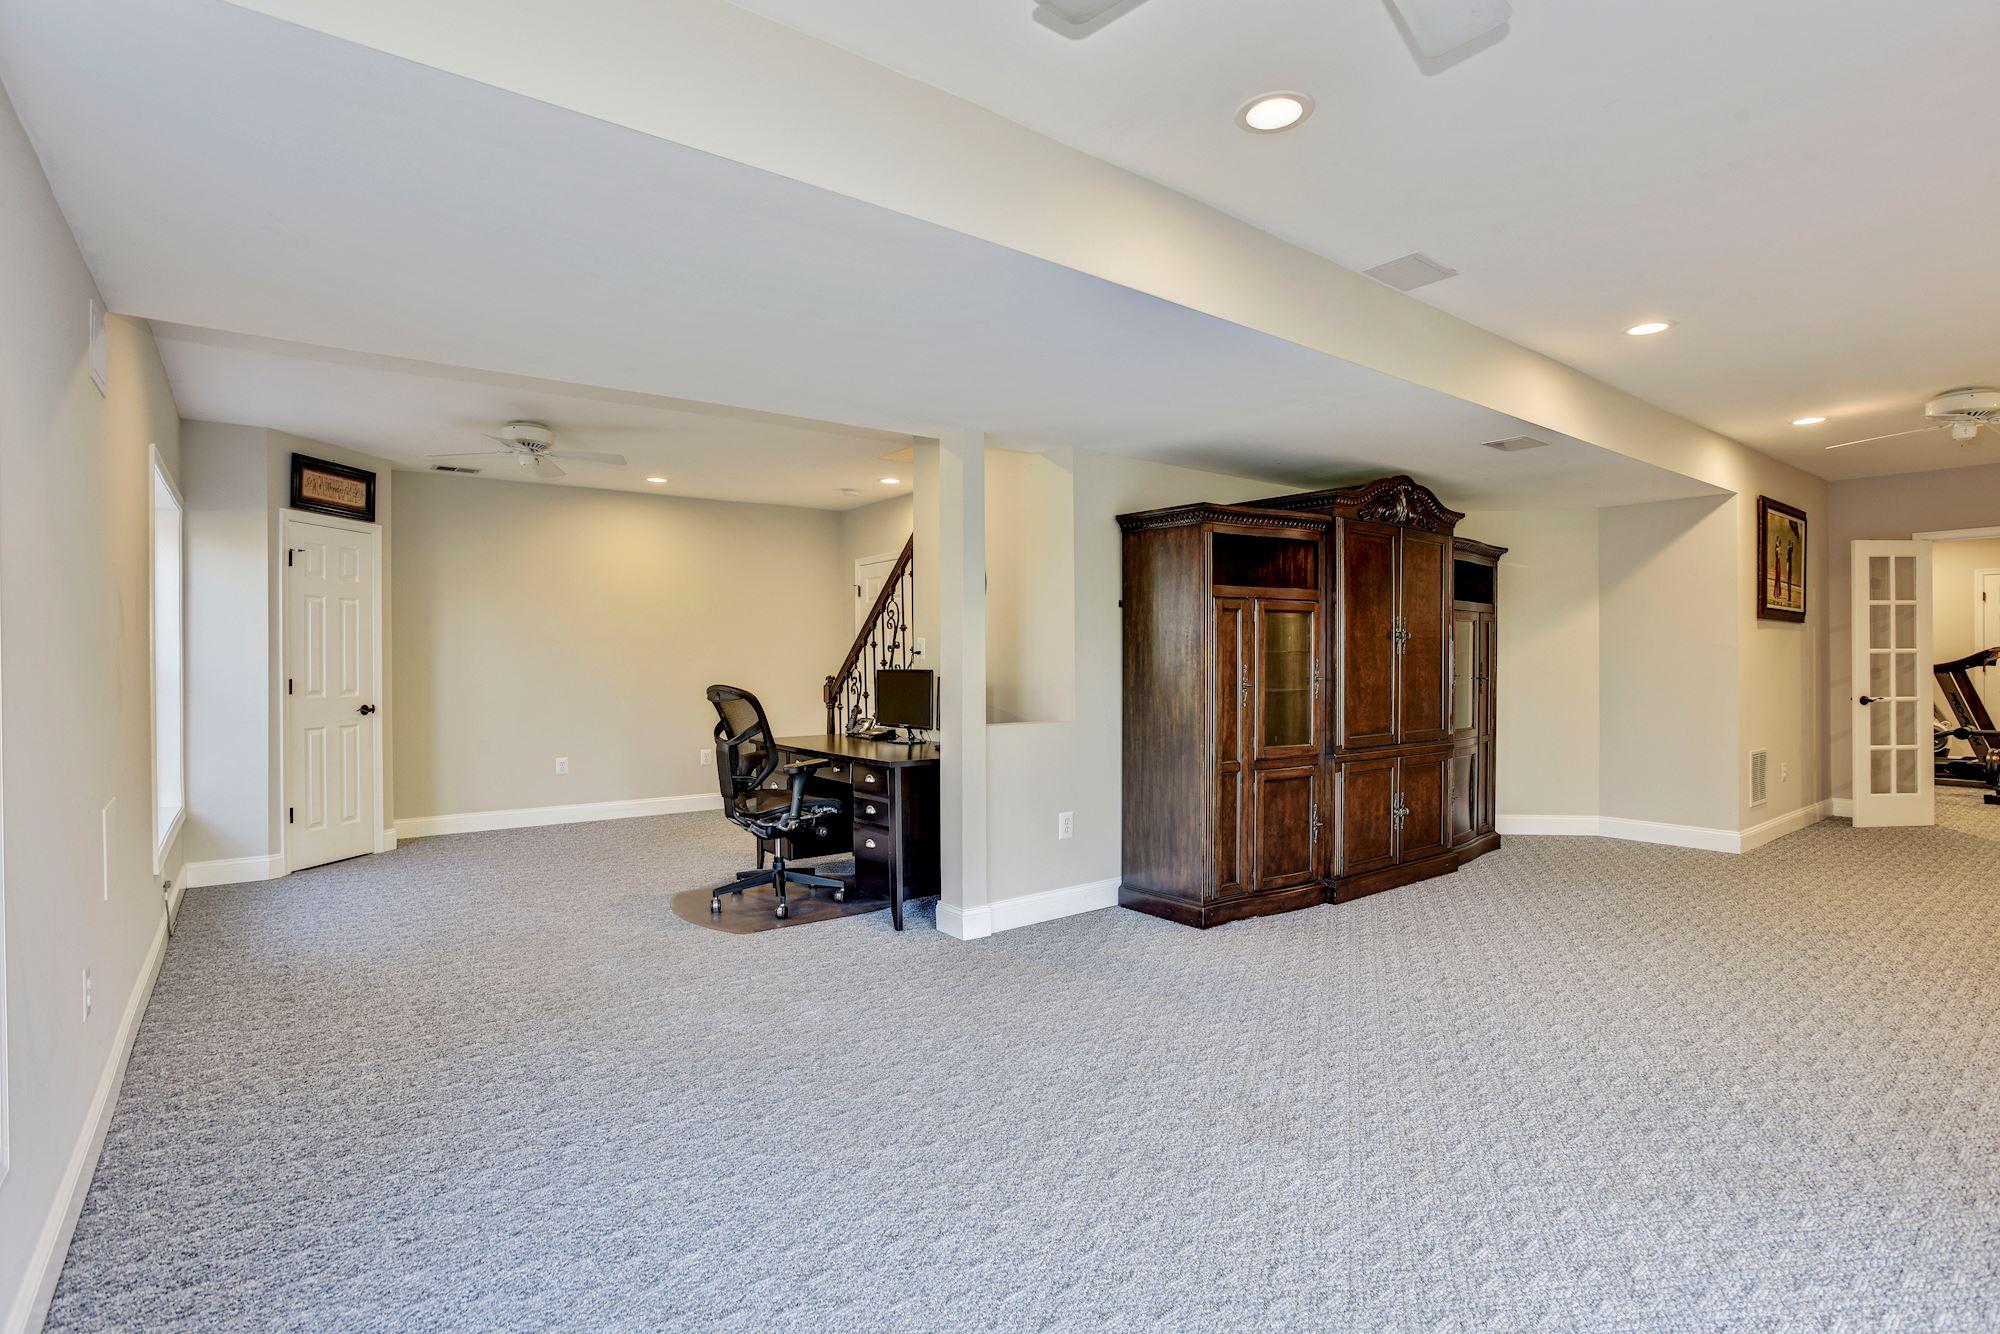 Burgess ceiling tiles